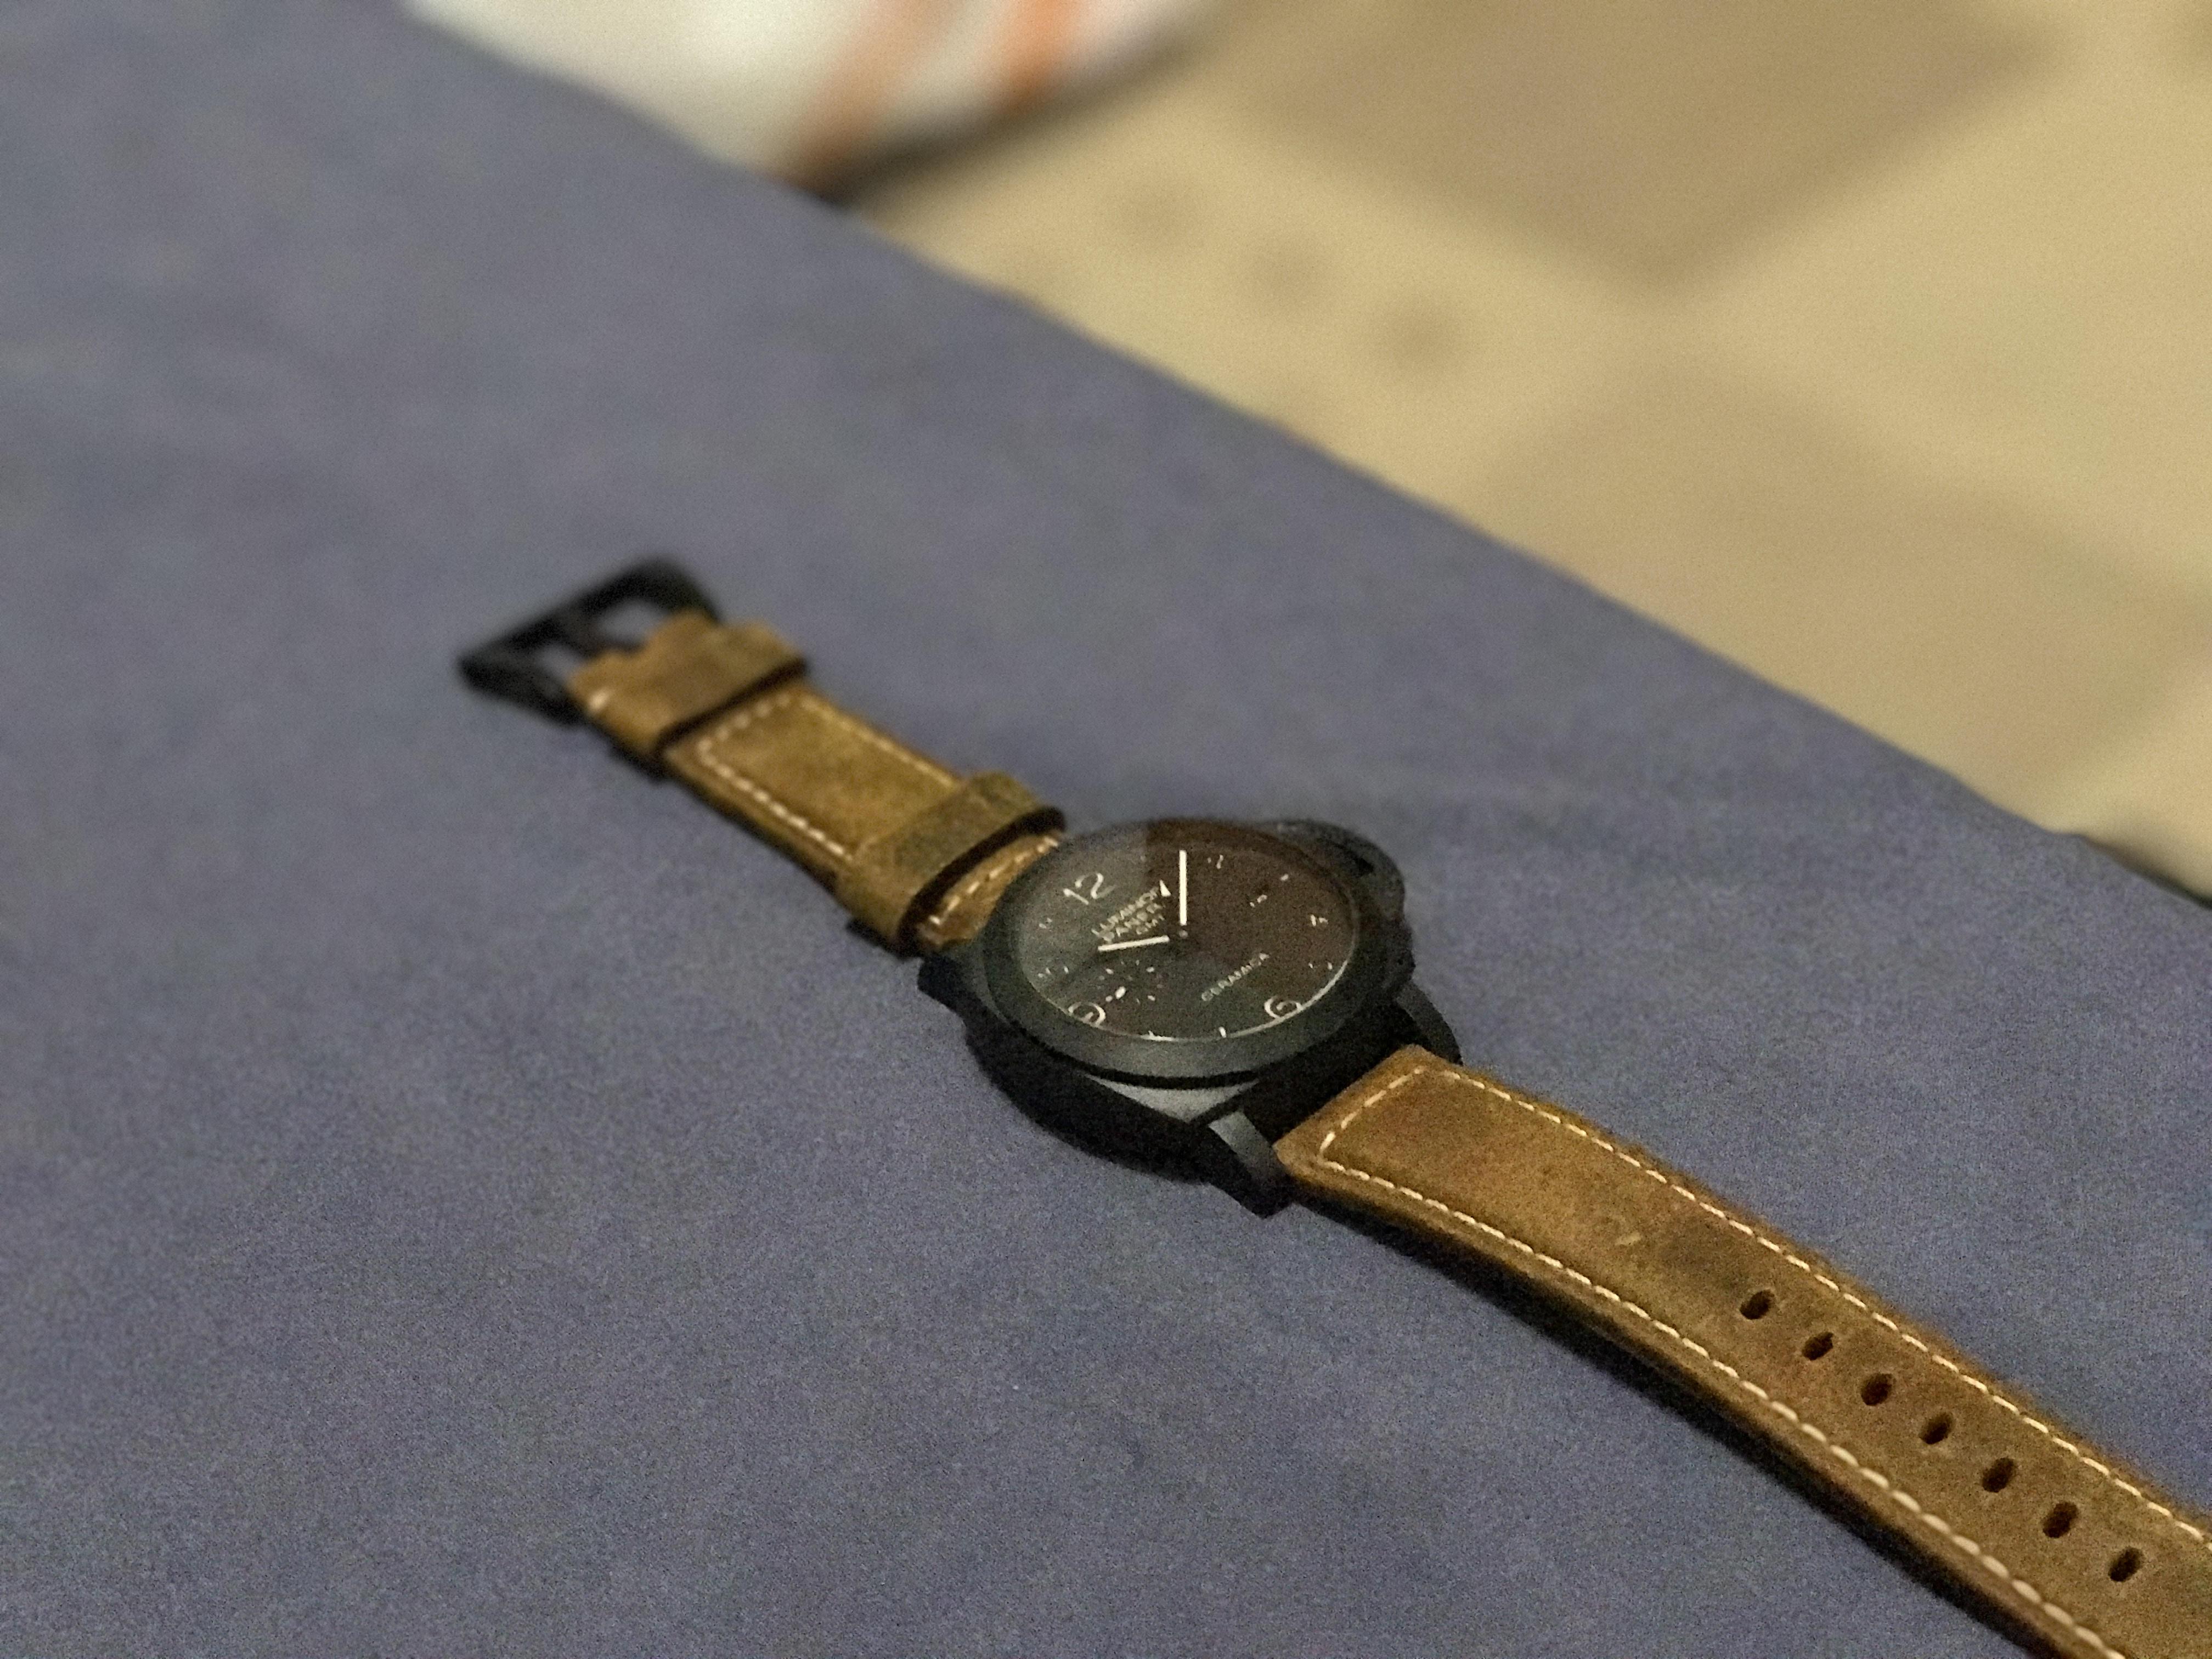 PAM 441 Watch